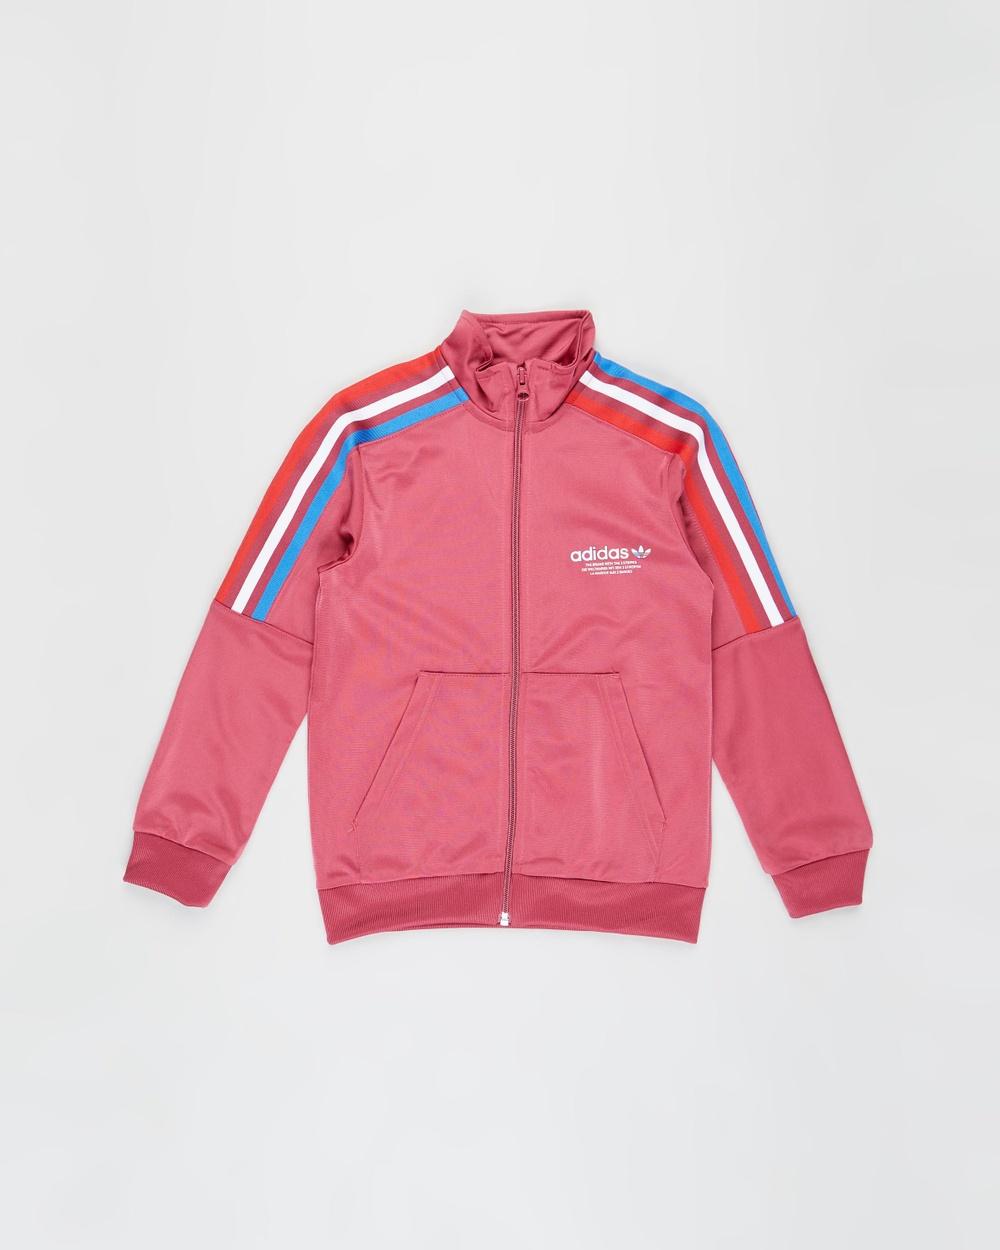 adidas Originals Adicolour Track Jacket Teens Coats & Jackets Wild Pink